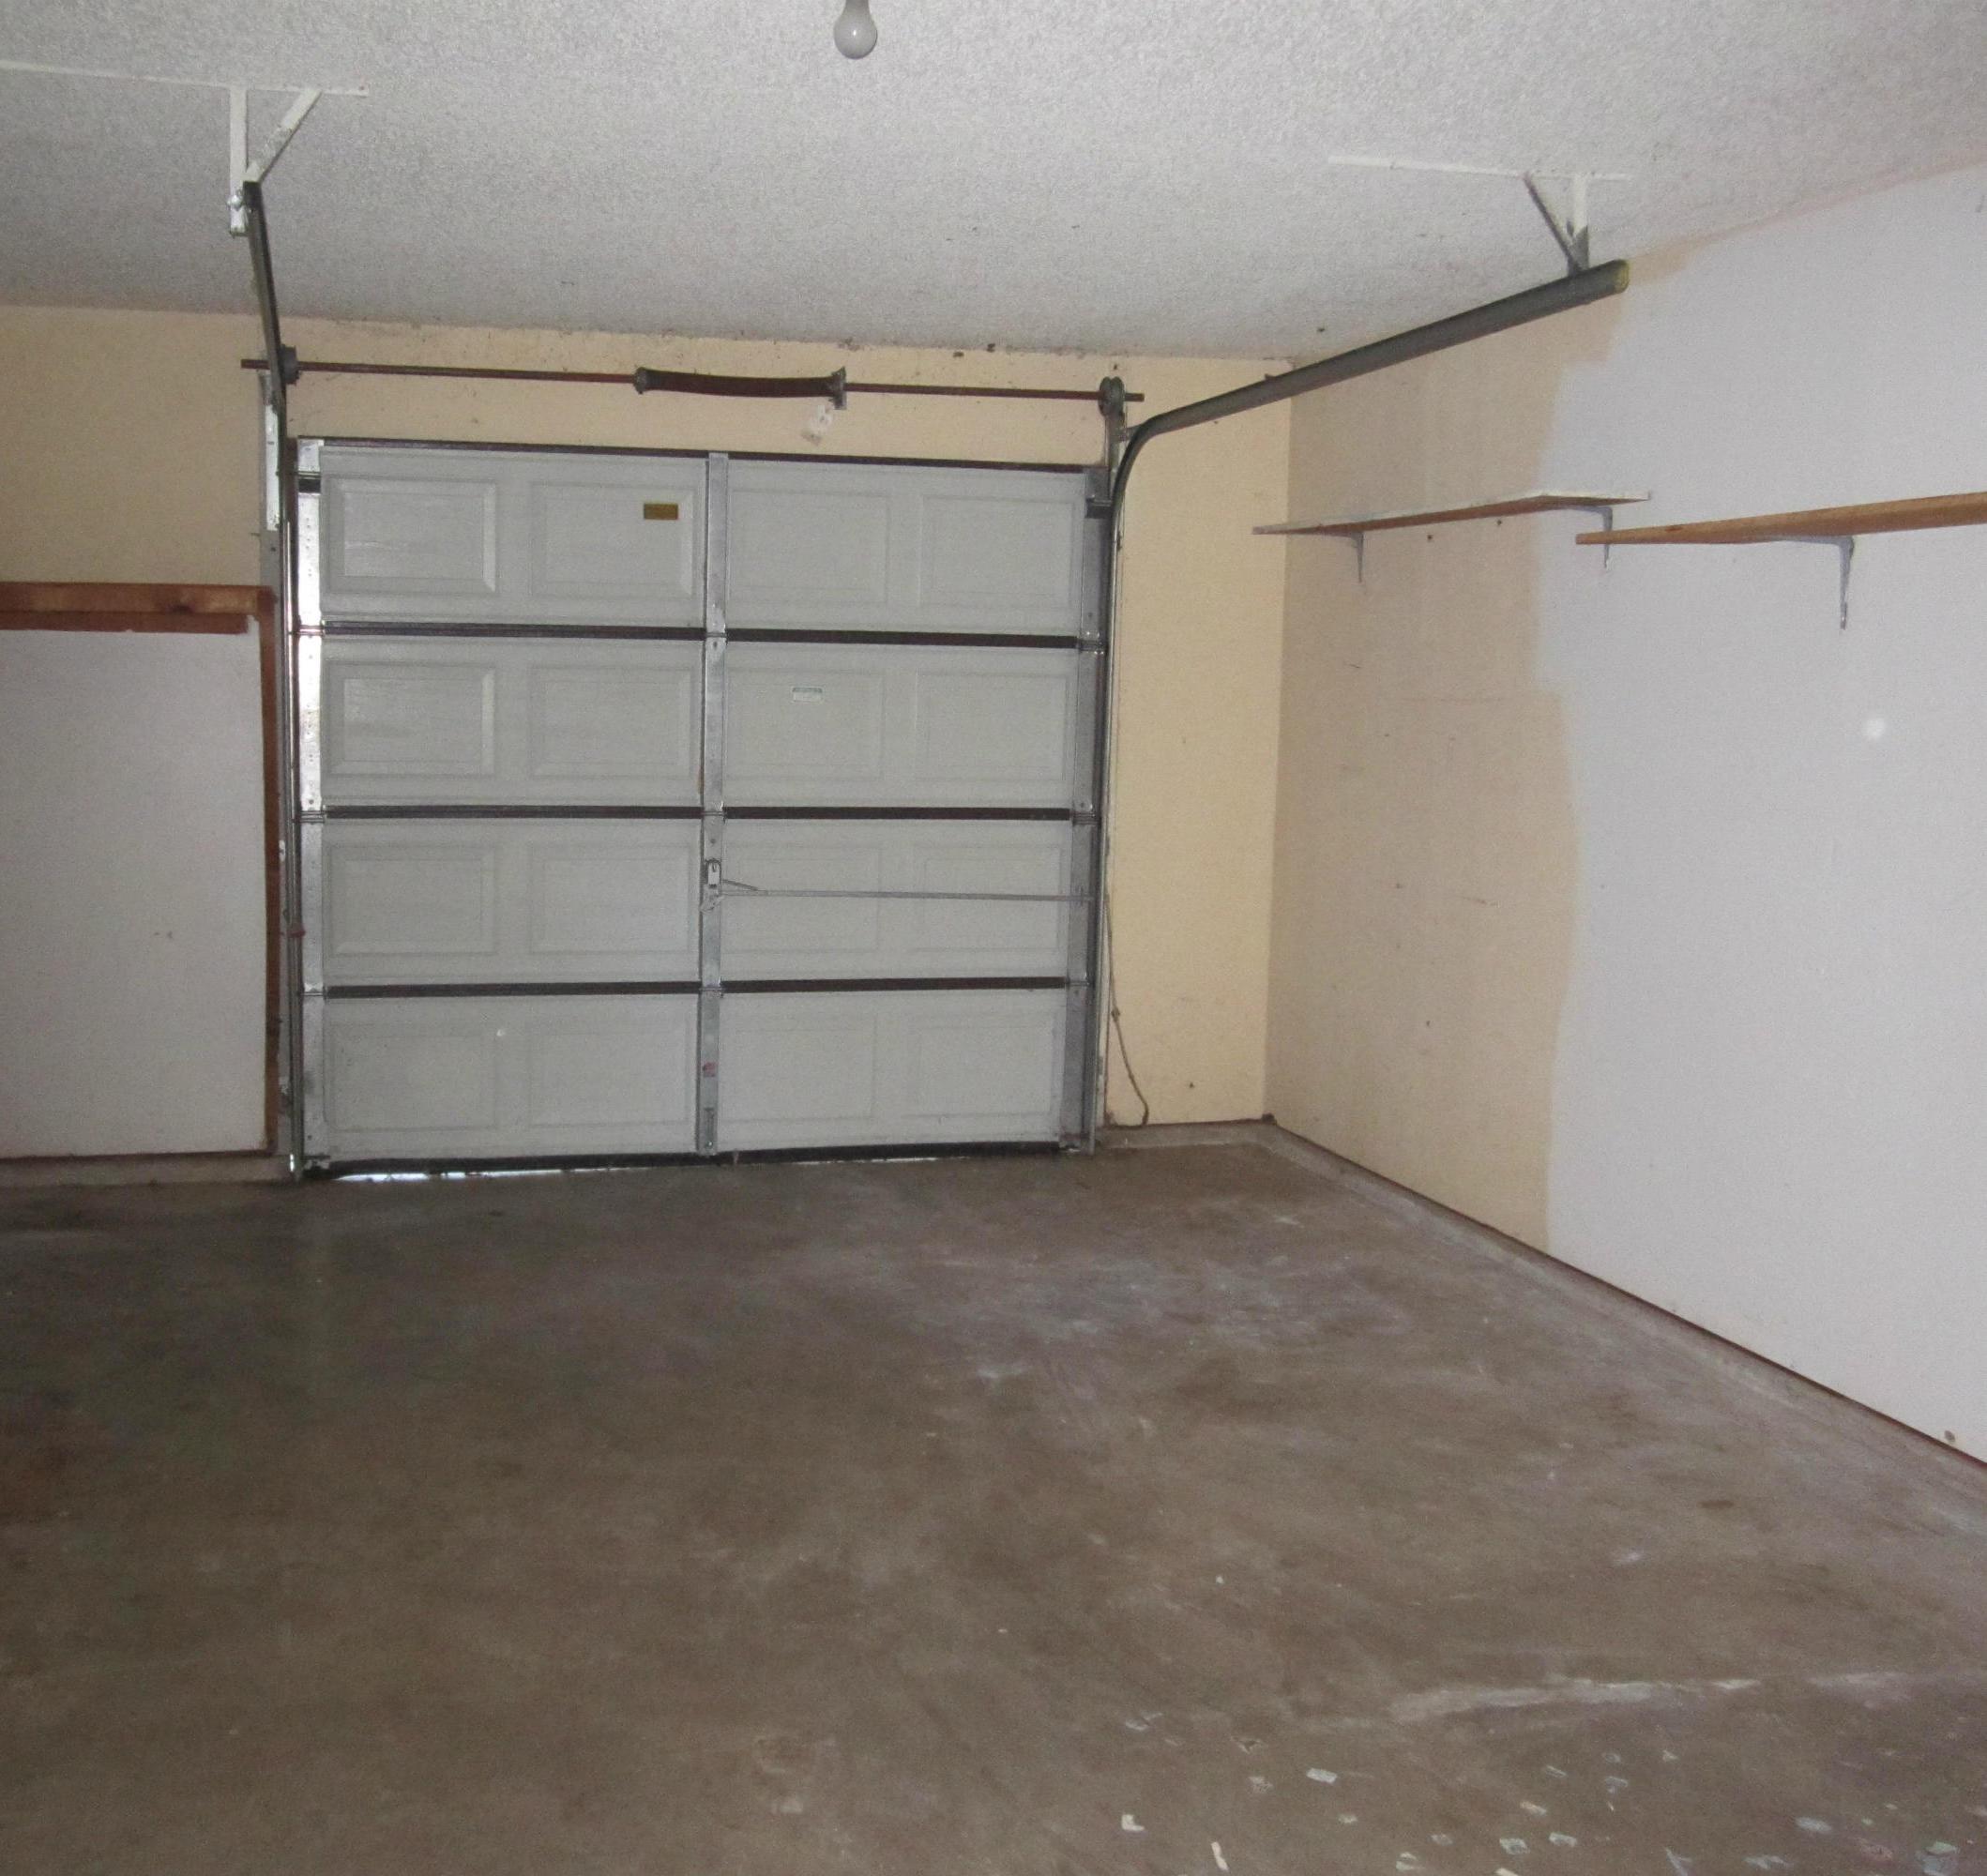 Closed | 1535 102ND Street Grove, OK 74344 11